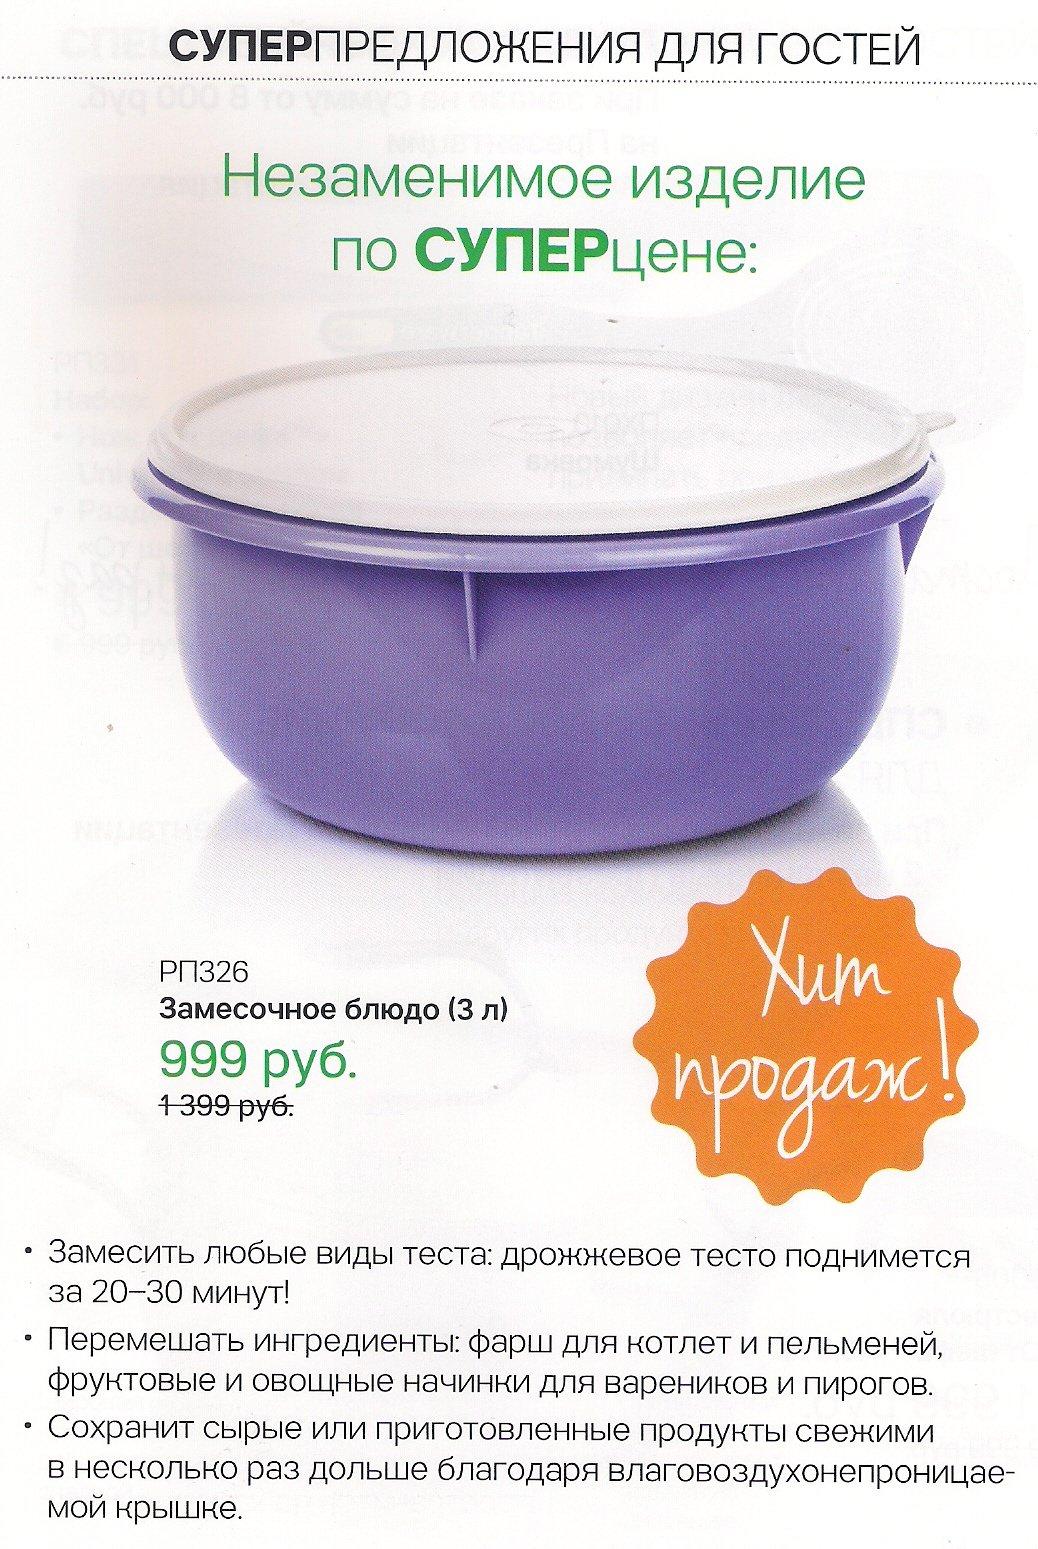 http://tupperware-online.ru/images/upload/9d.jpg